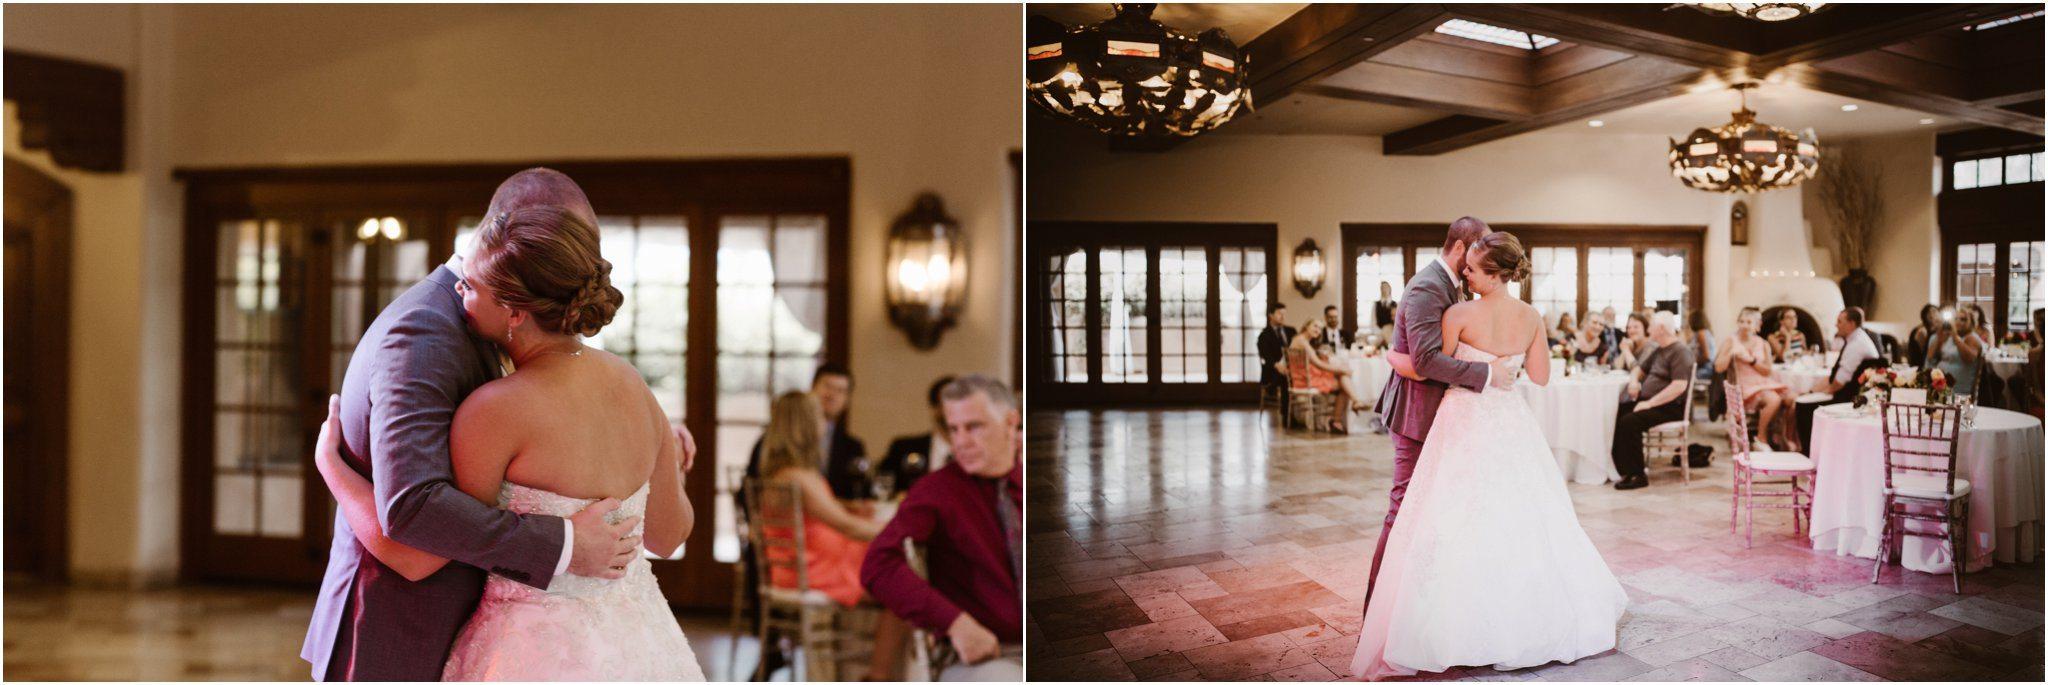 0071albuquerque-wedding-photographer_-santa-fe-wedding-photographer_-southwest-wedding-photography_-blue-rose-studio